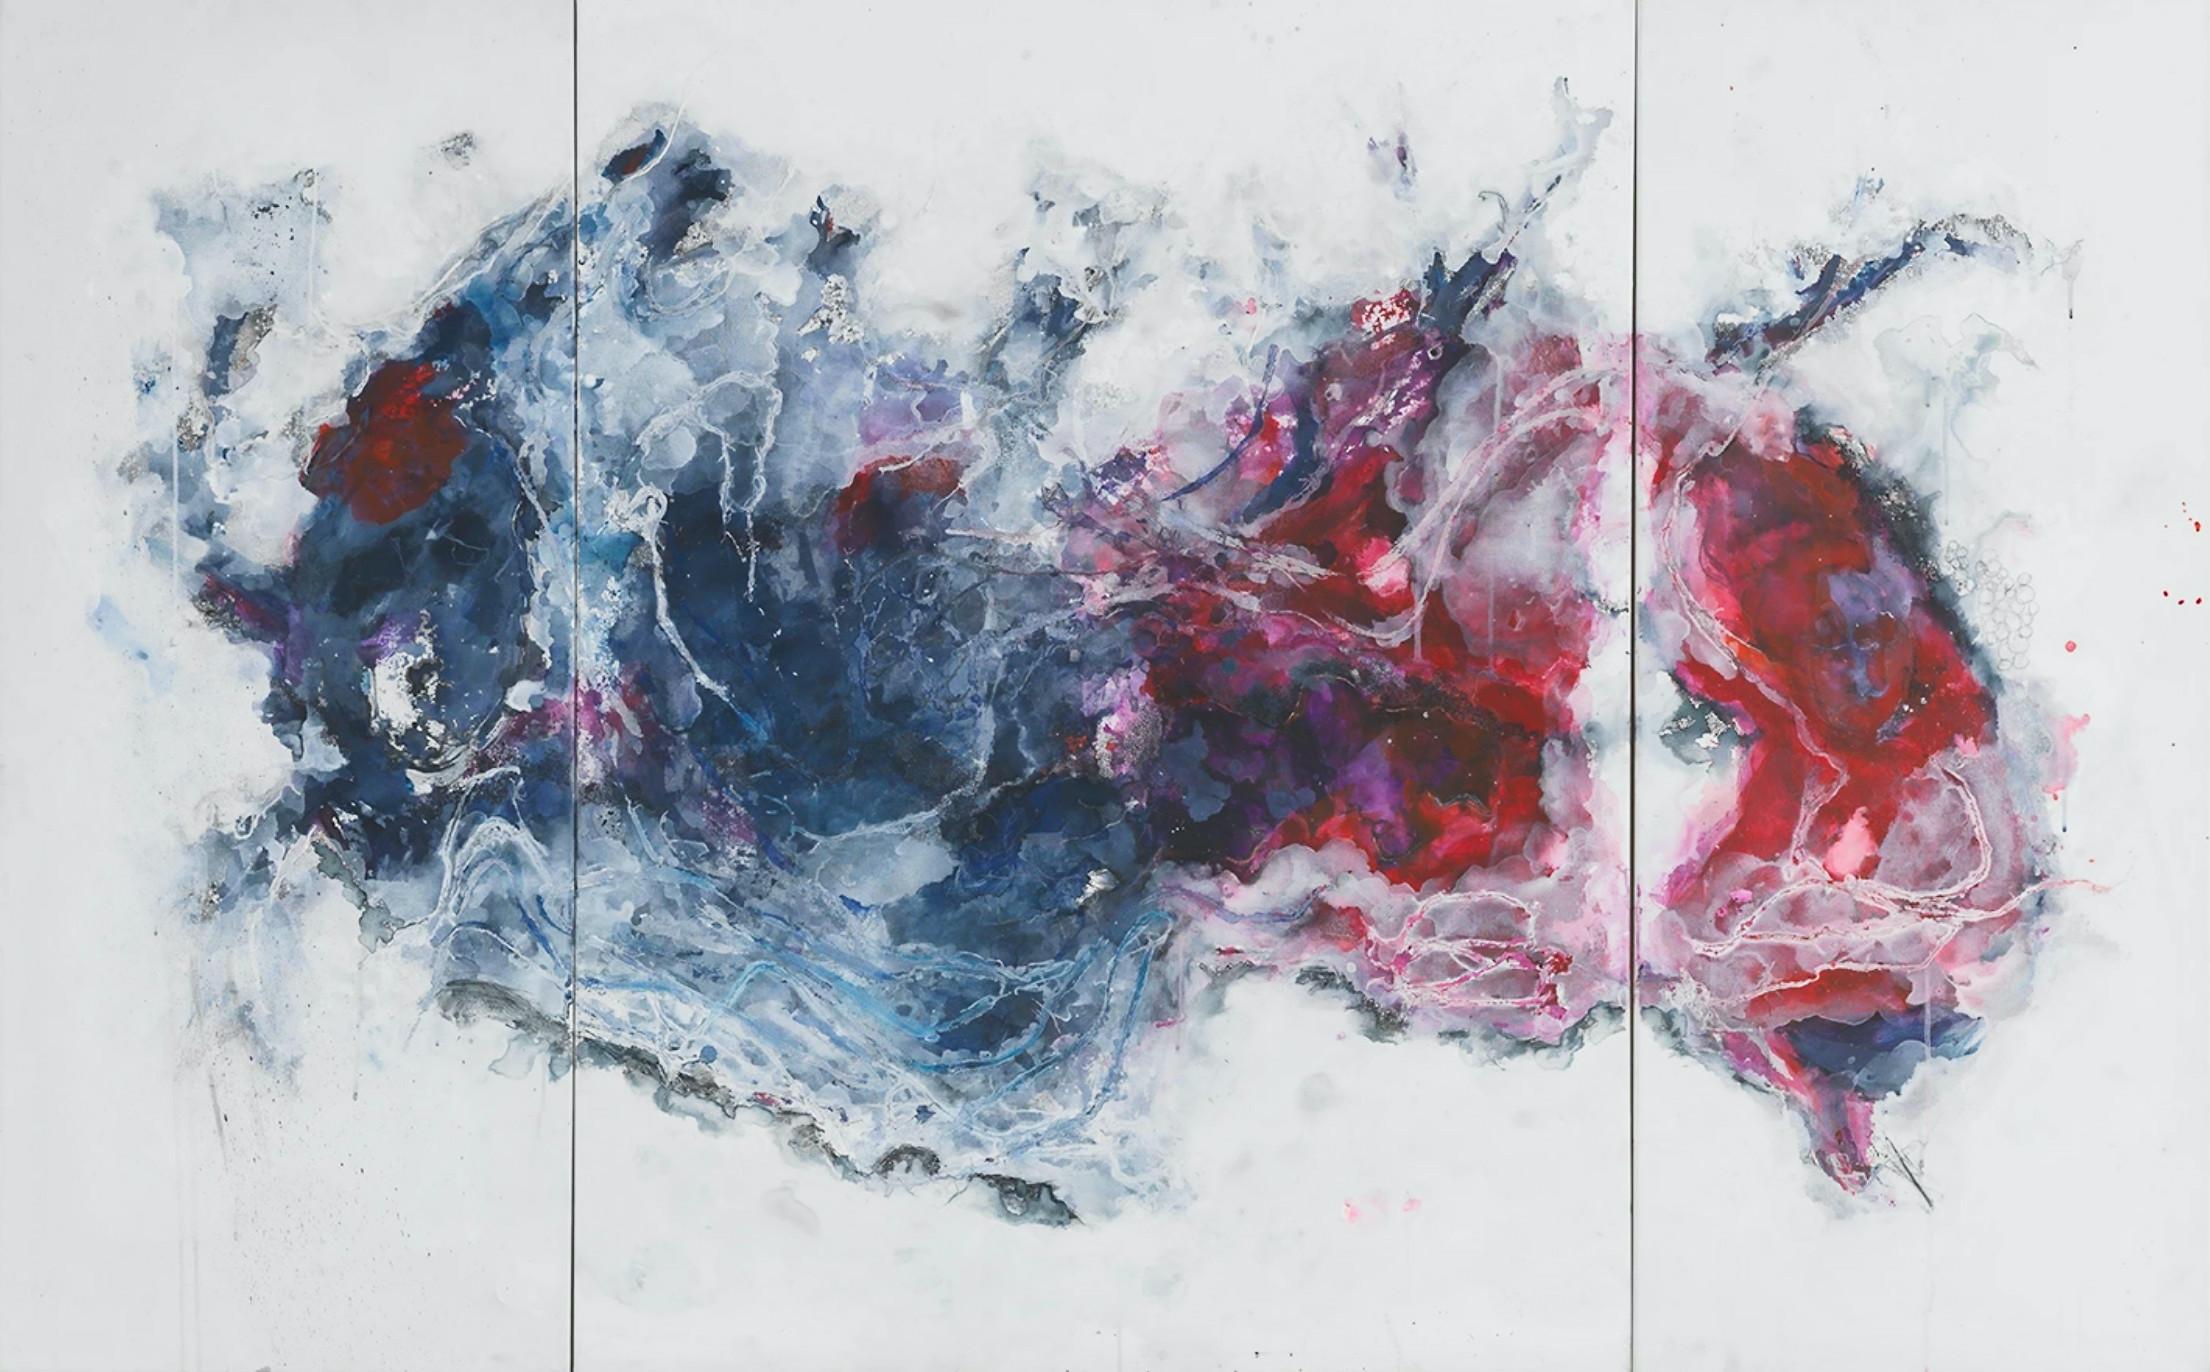 Peinture abstraite de Tarfa Fahad